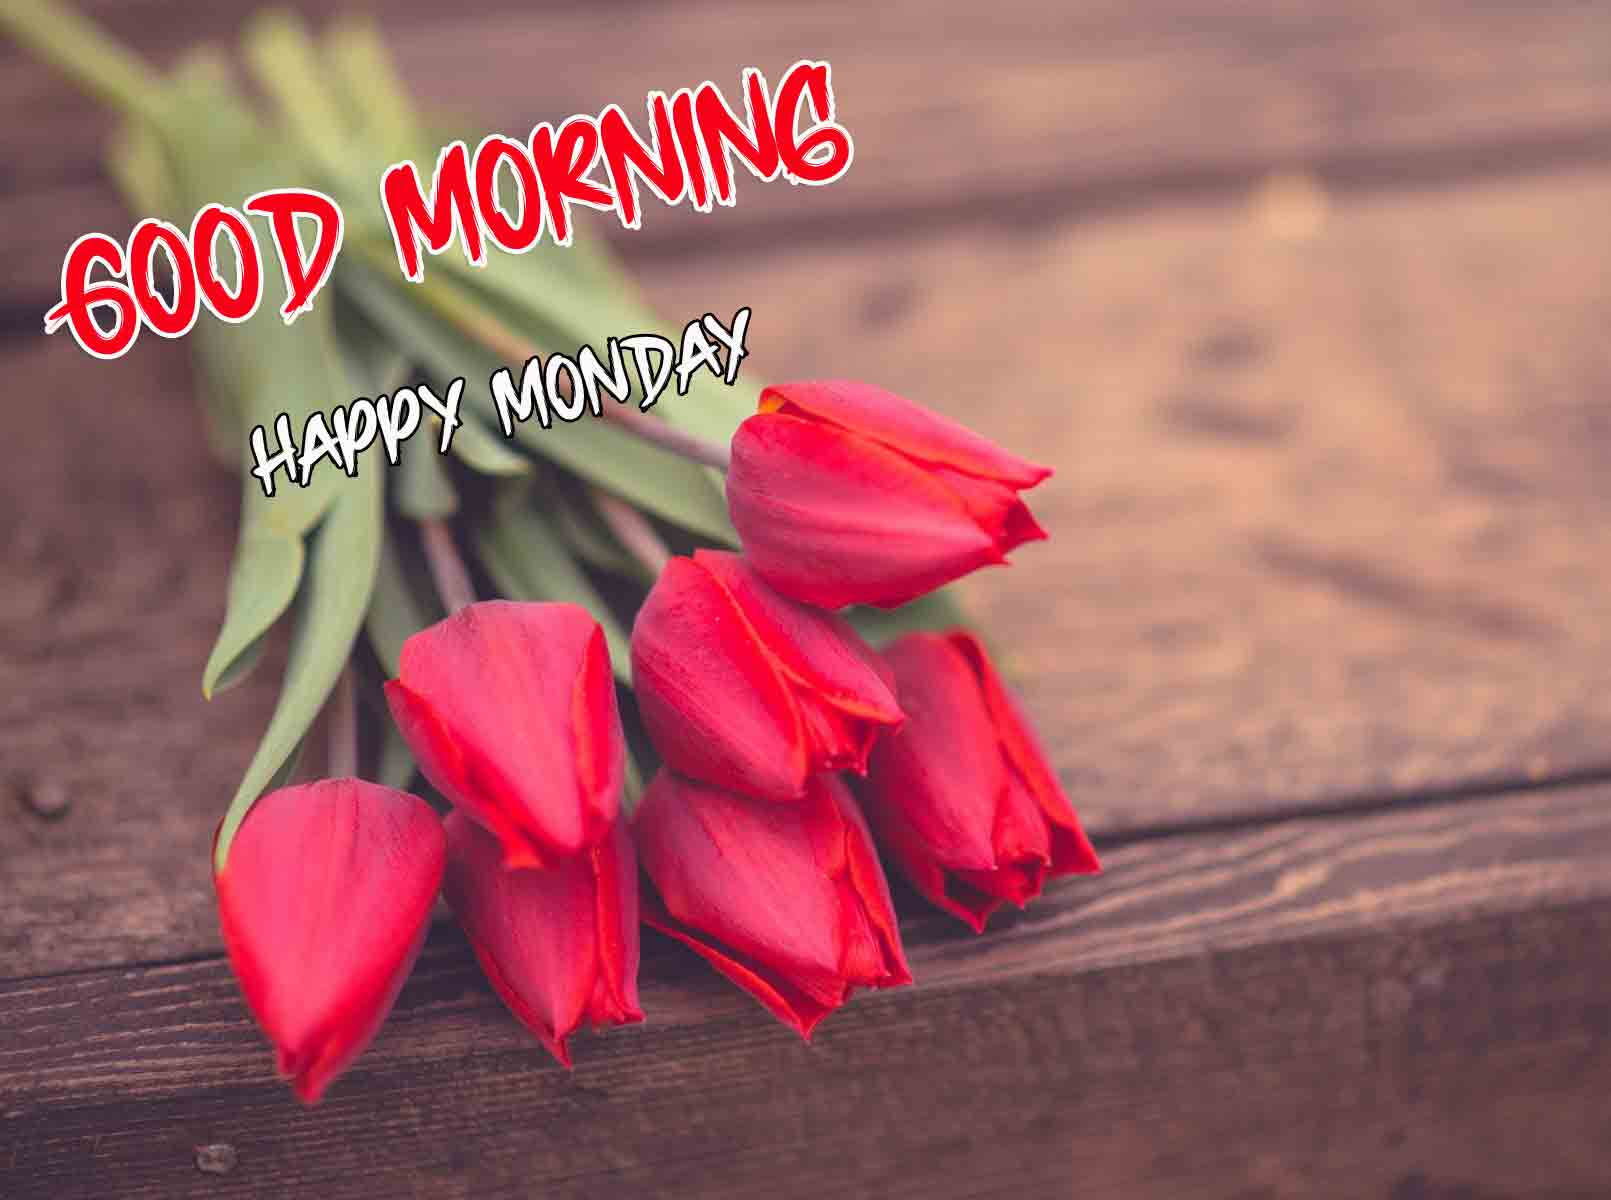 Beautiful Latest Monday Good Morning Images pics free hd